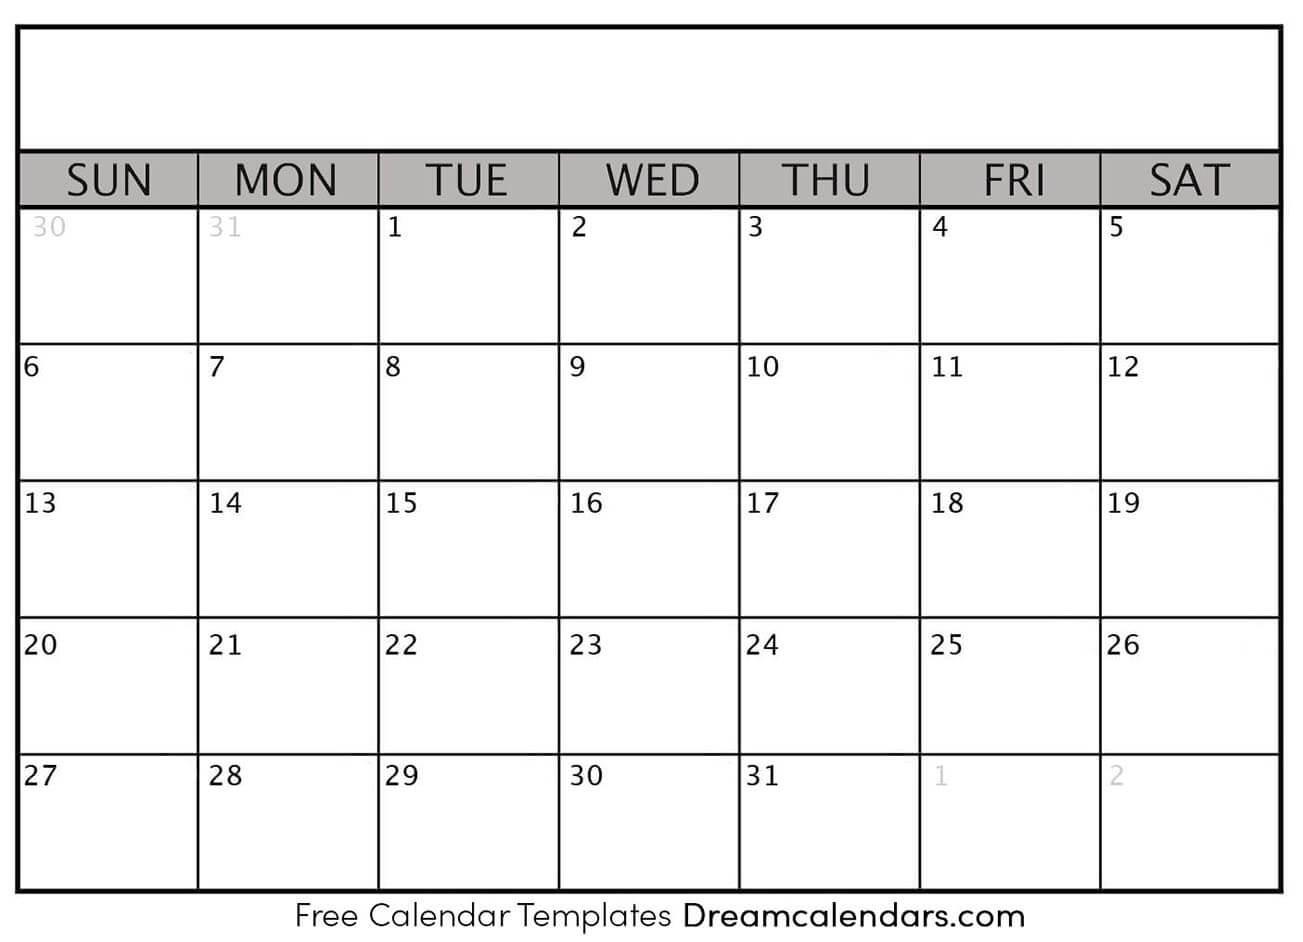 Printable Blank Calendar 2021 | Dream Calendars  Full Page Blank Calendar